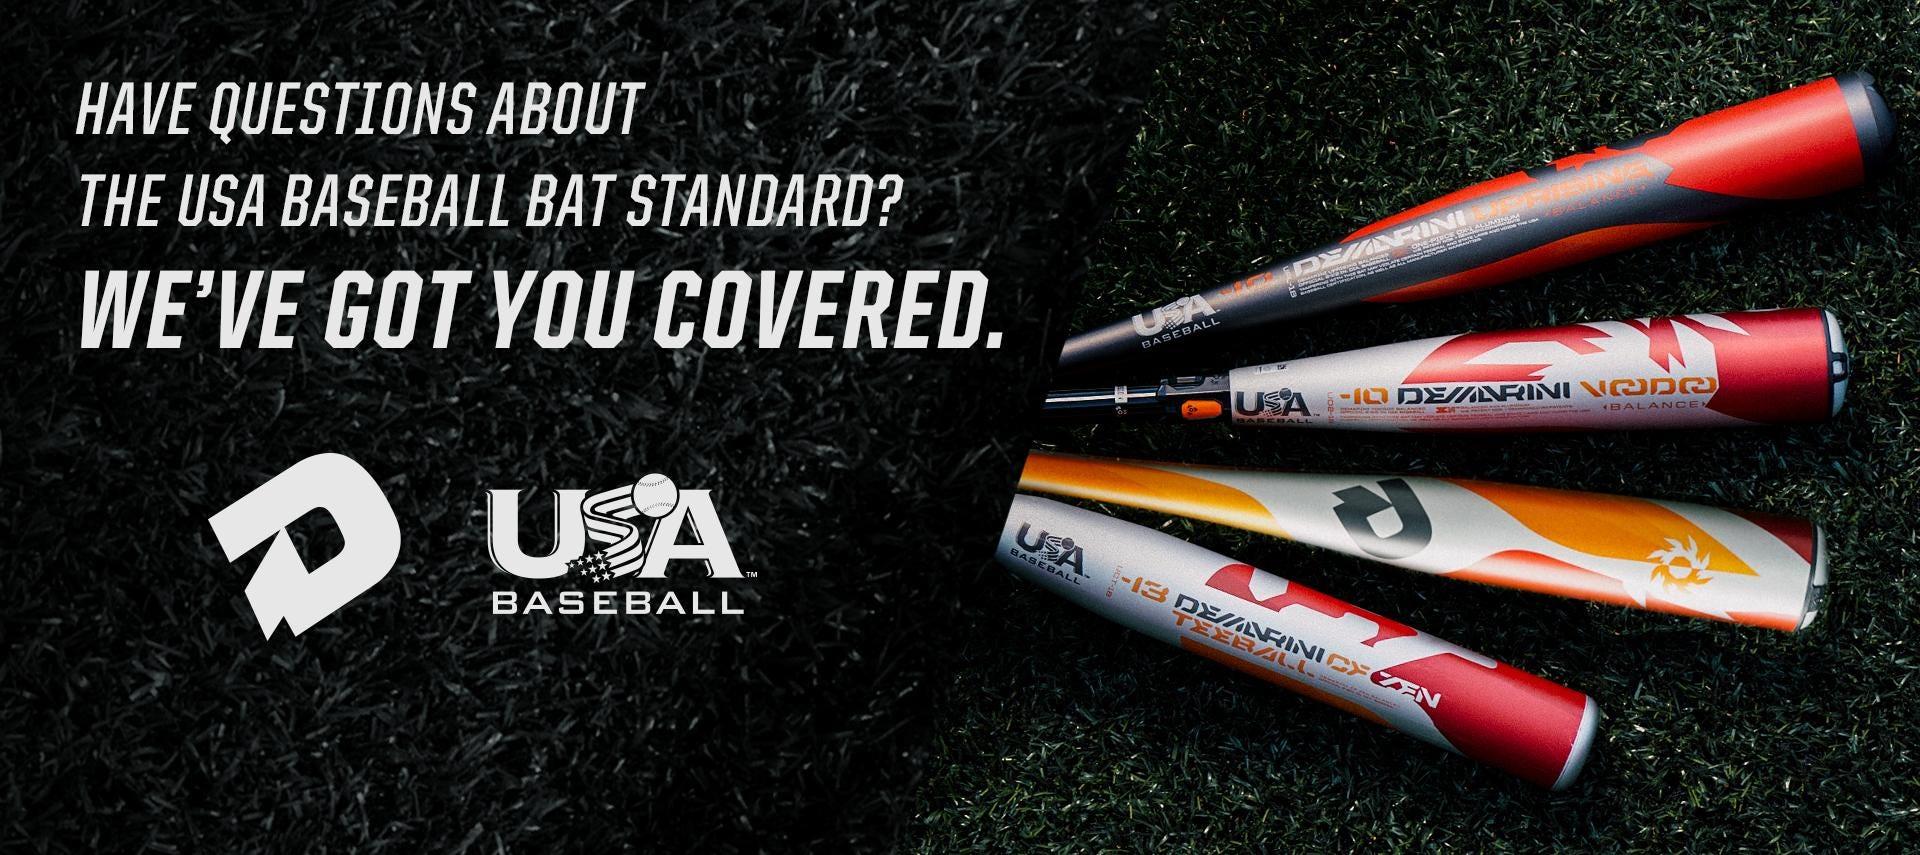 DeMarini How to Choose a Bat - USA Baseball